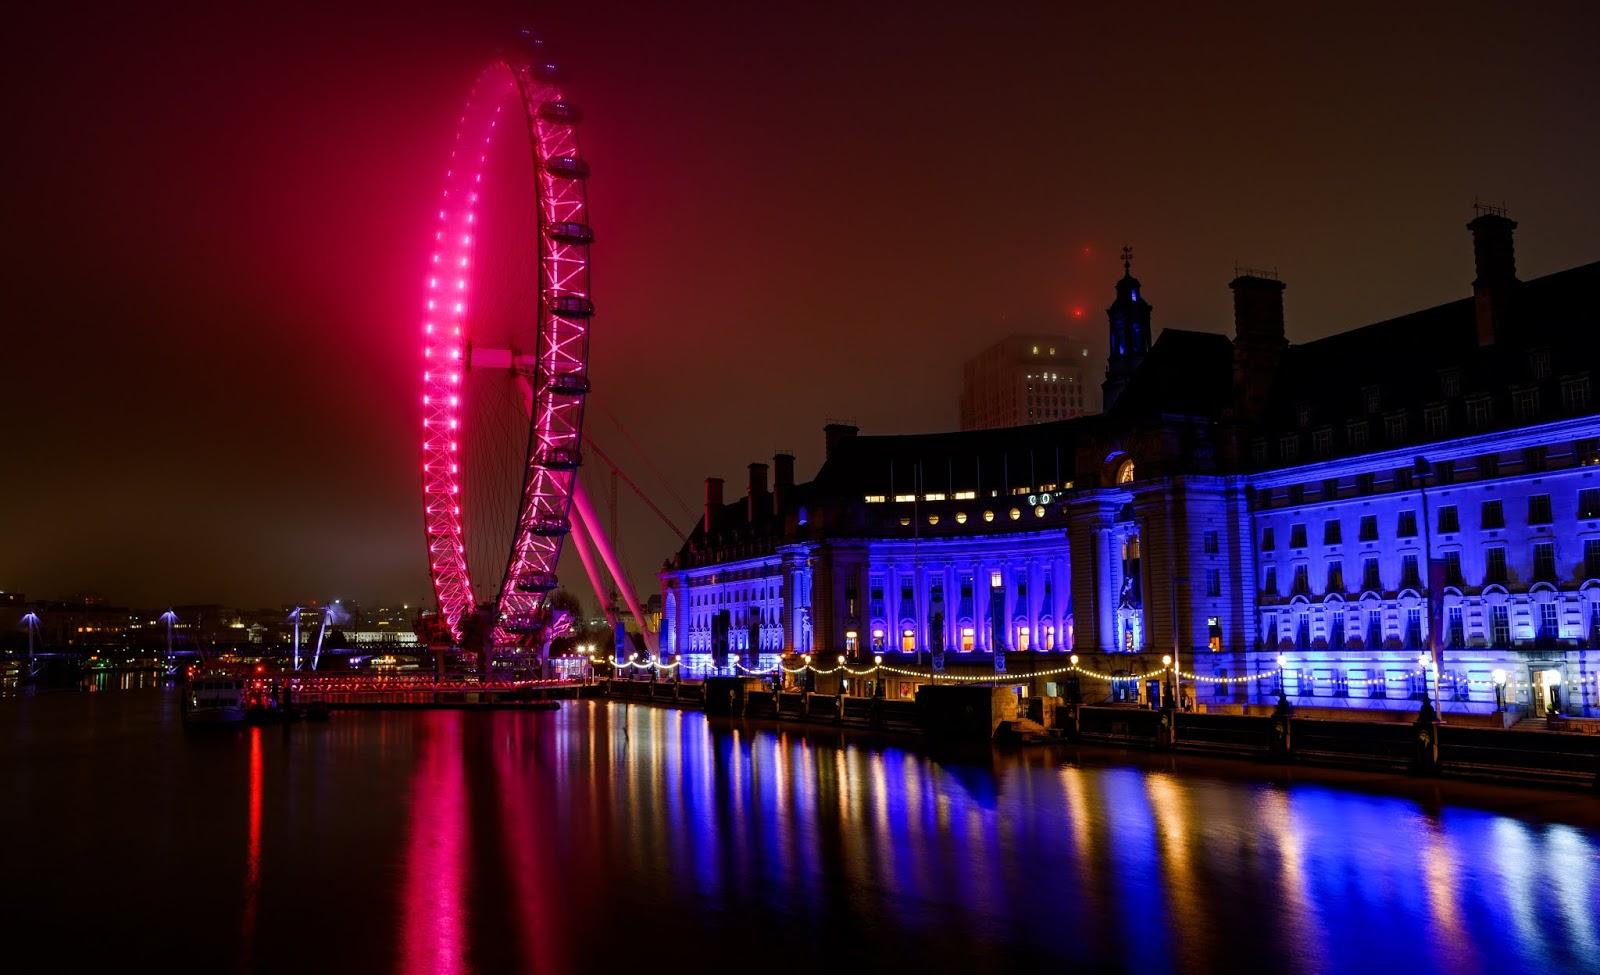 Amusement park, River Thames, Ferris Wheel, Blue Neon, Night, Cityscape, World